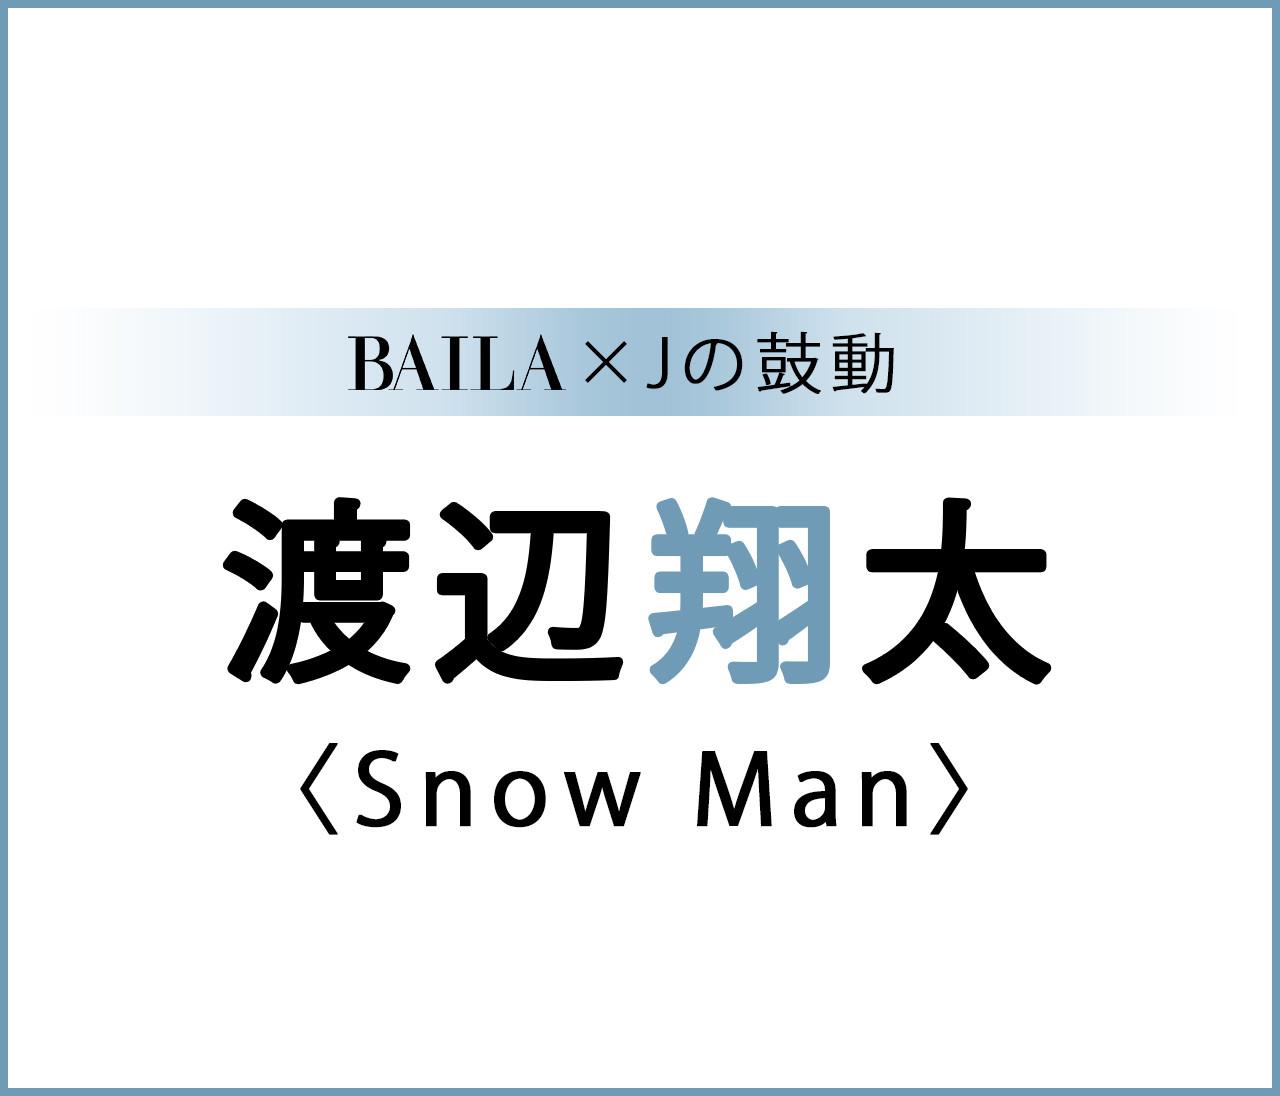 【 #SnowMan #渡辺翔太 】渡辺翔太スペシャルインタビュー!【BAILA × Jの鼓動】